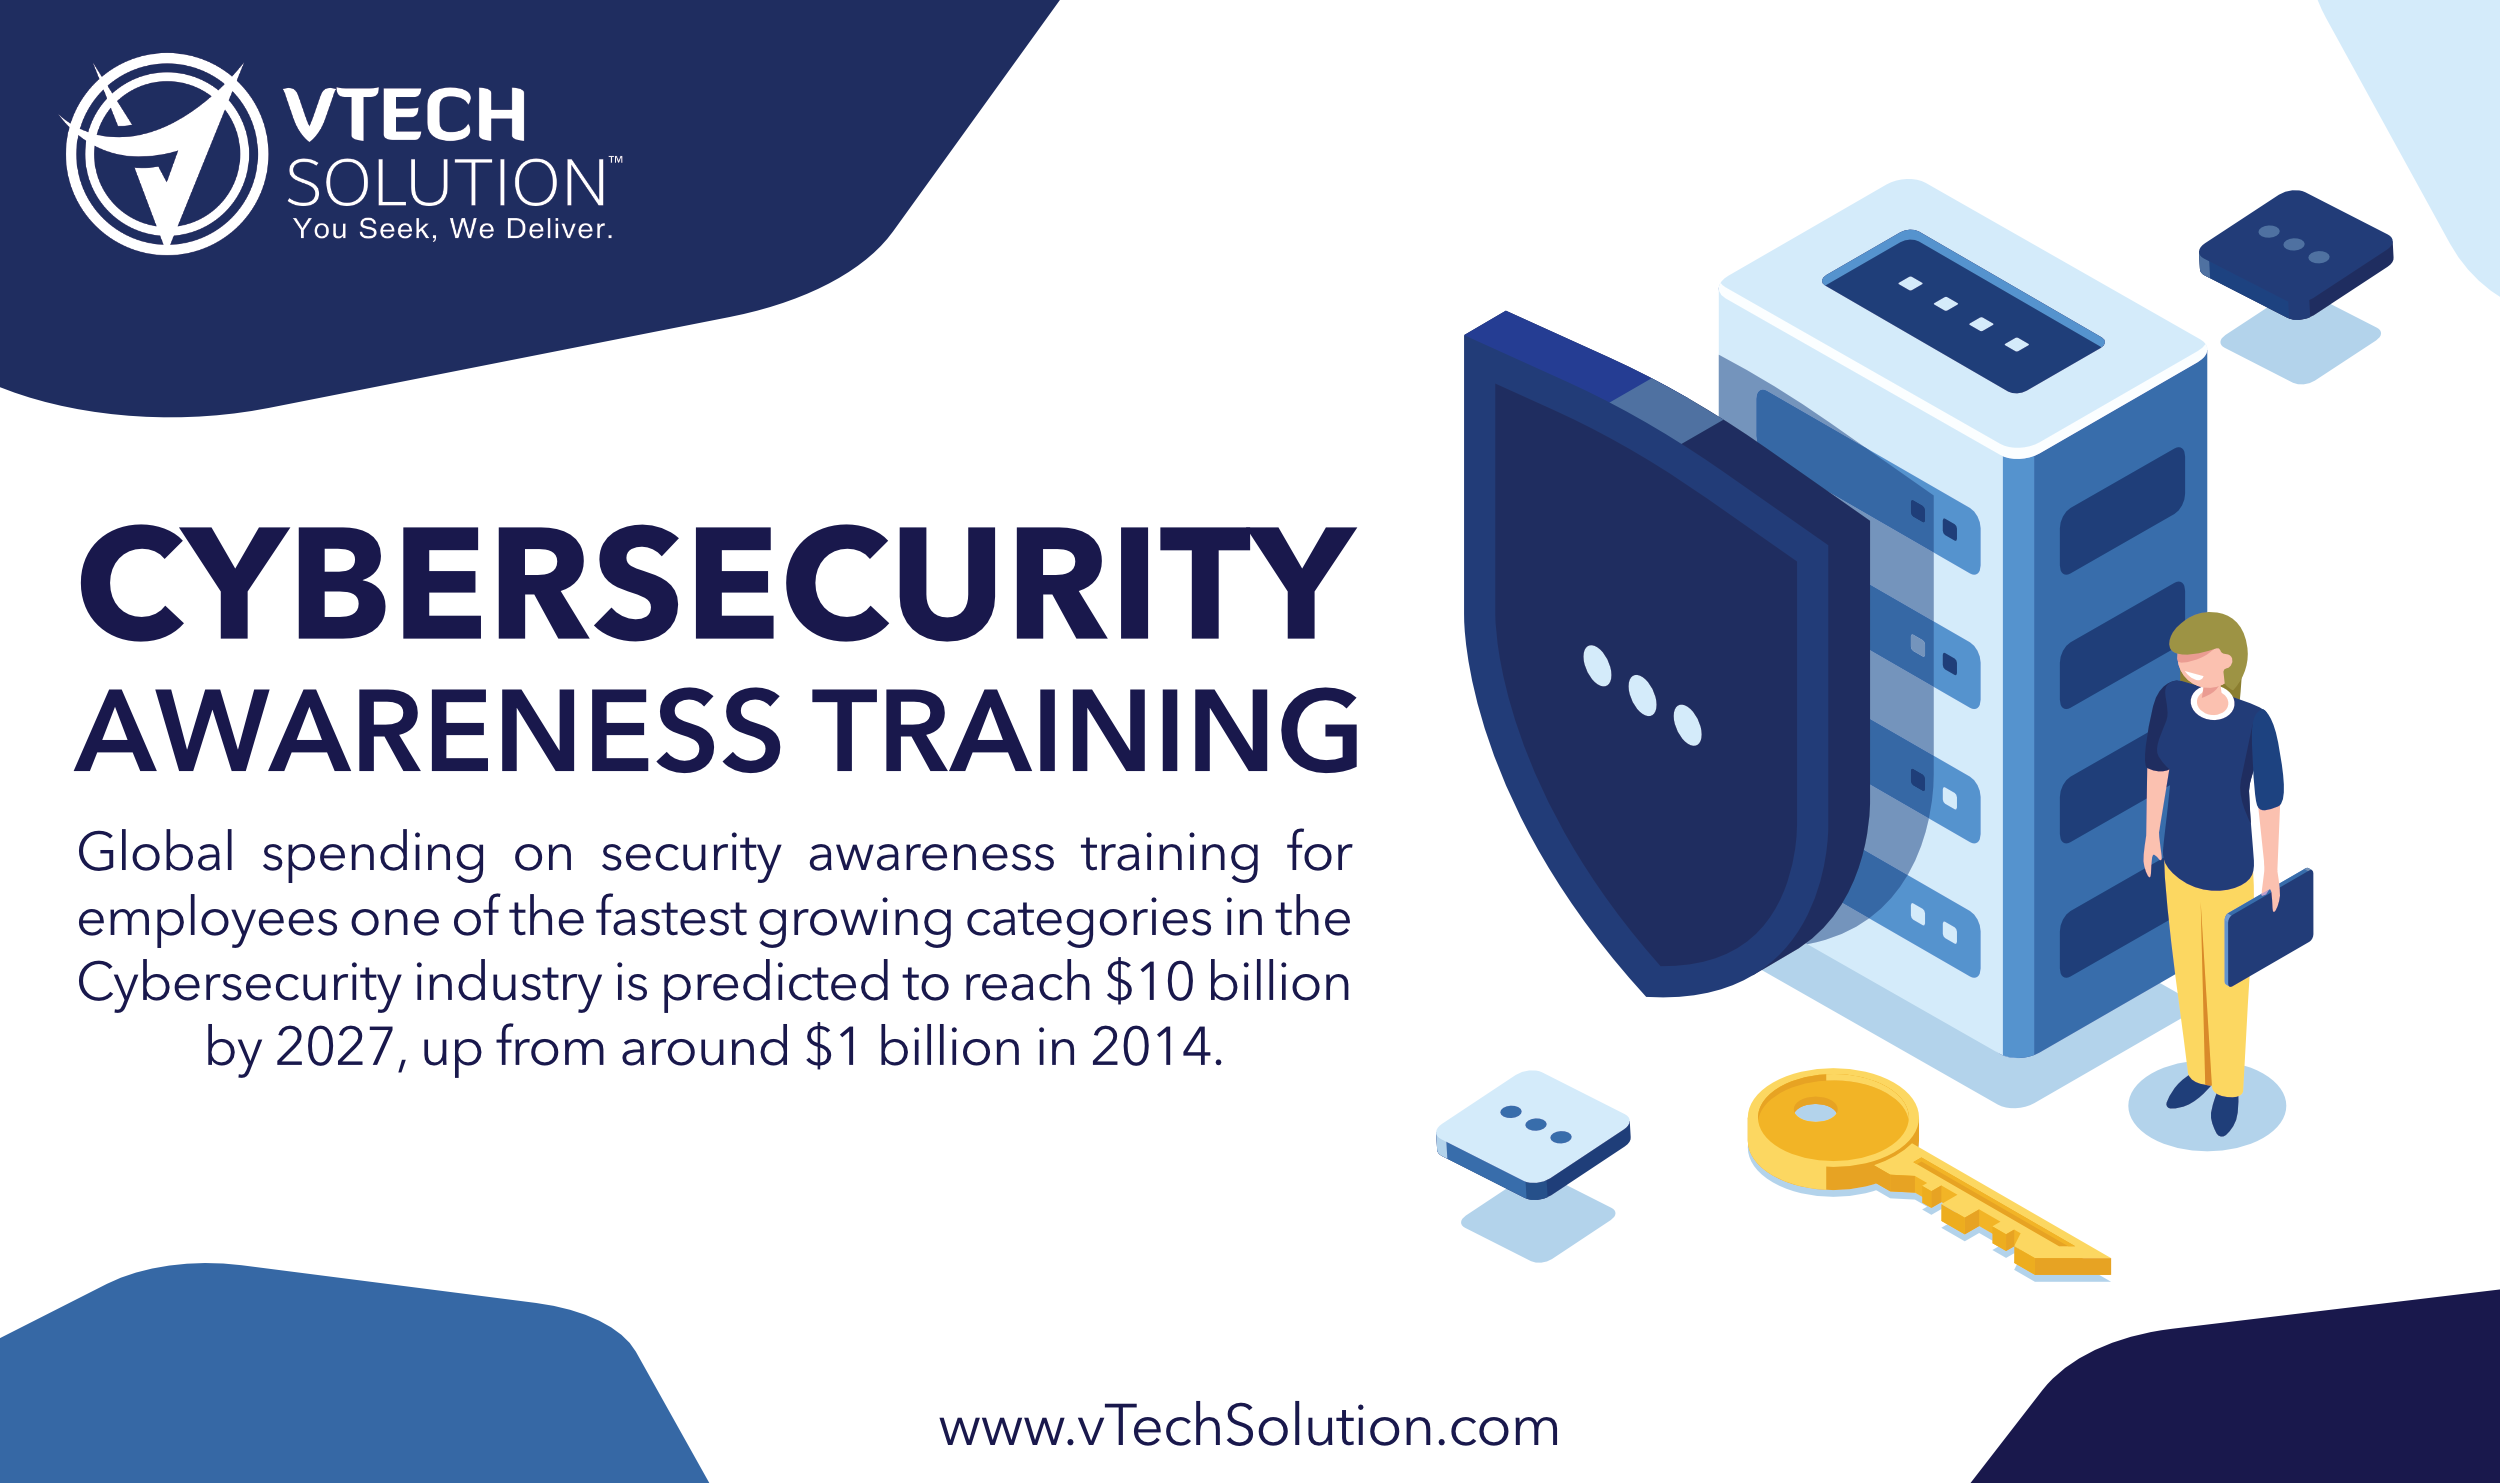 Cybersecurity Awareness Training Cyber Security Awareness Cyber Security Managed It Services